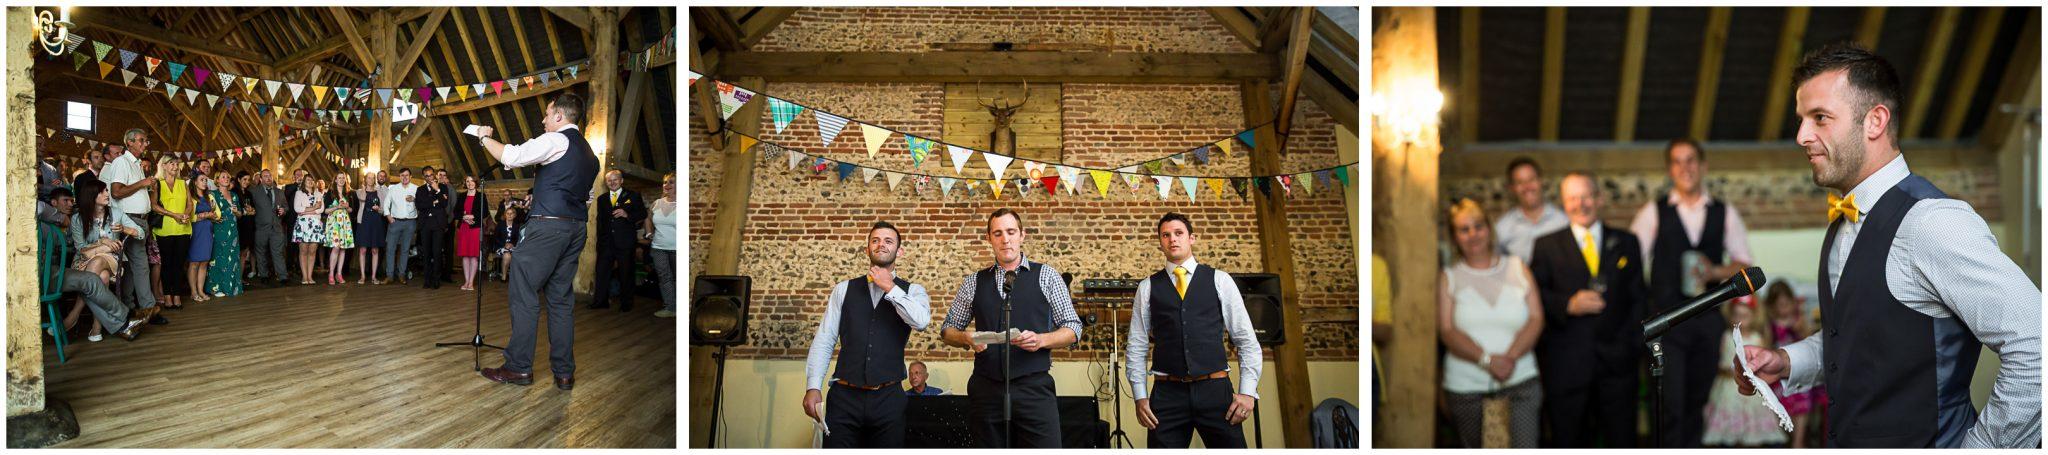 Winchester Great Hall wedding photography groomsmen speeches